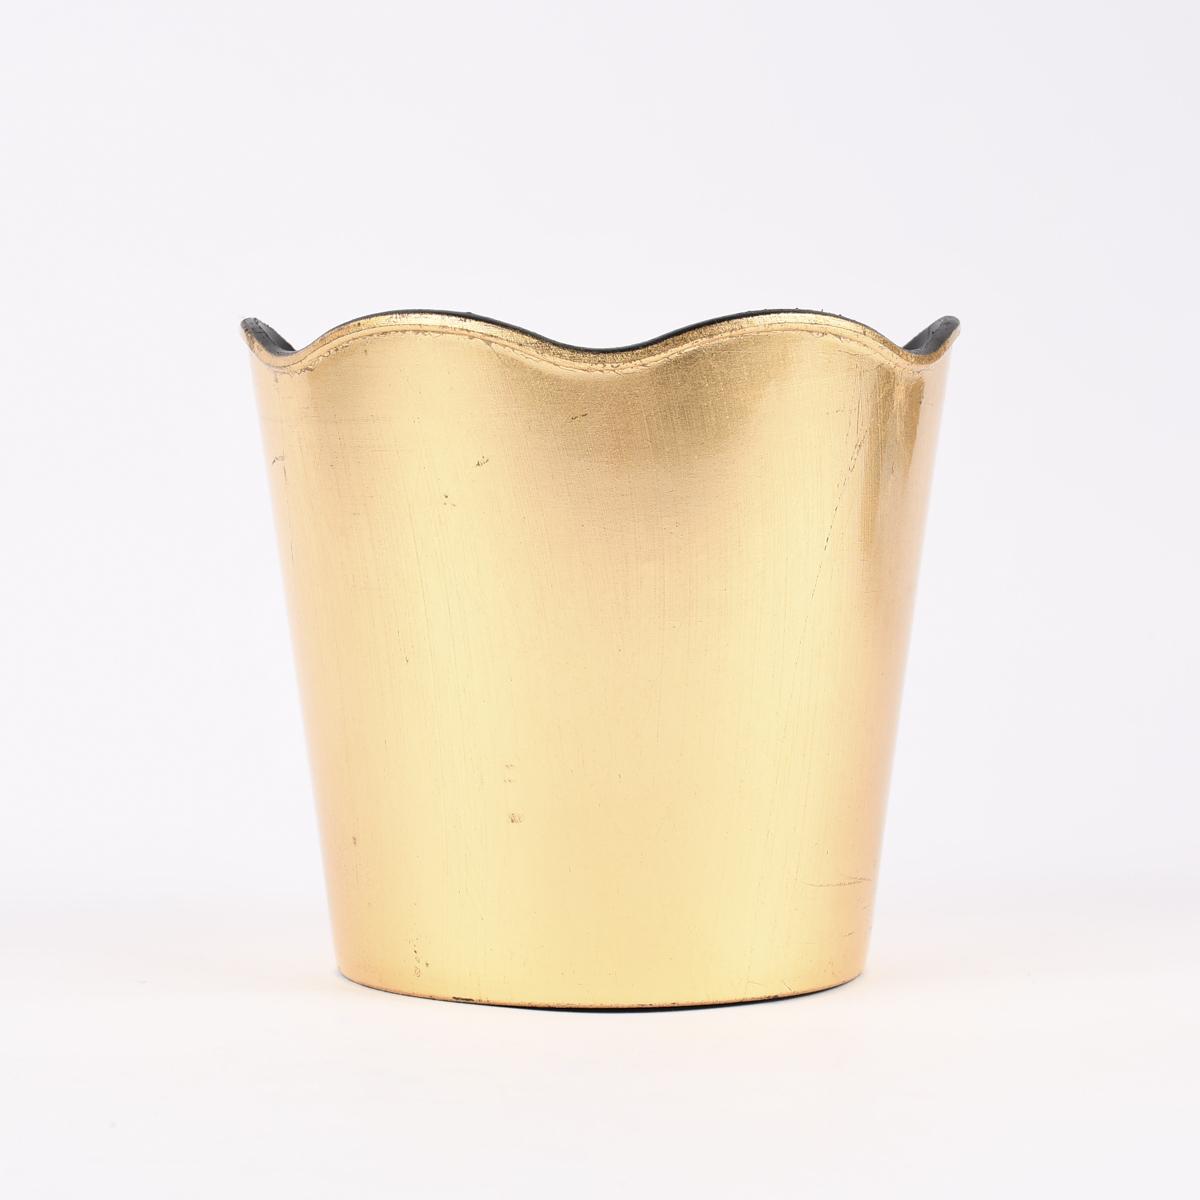 Übertopf mit gewelltem Rand Kunststoff goldfarbig 12x11cm